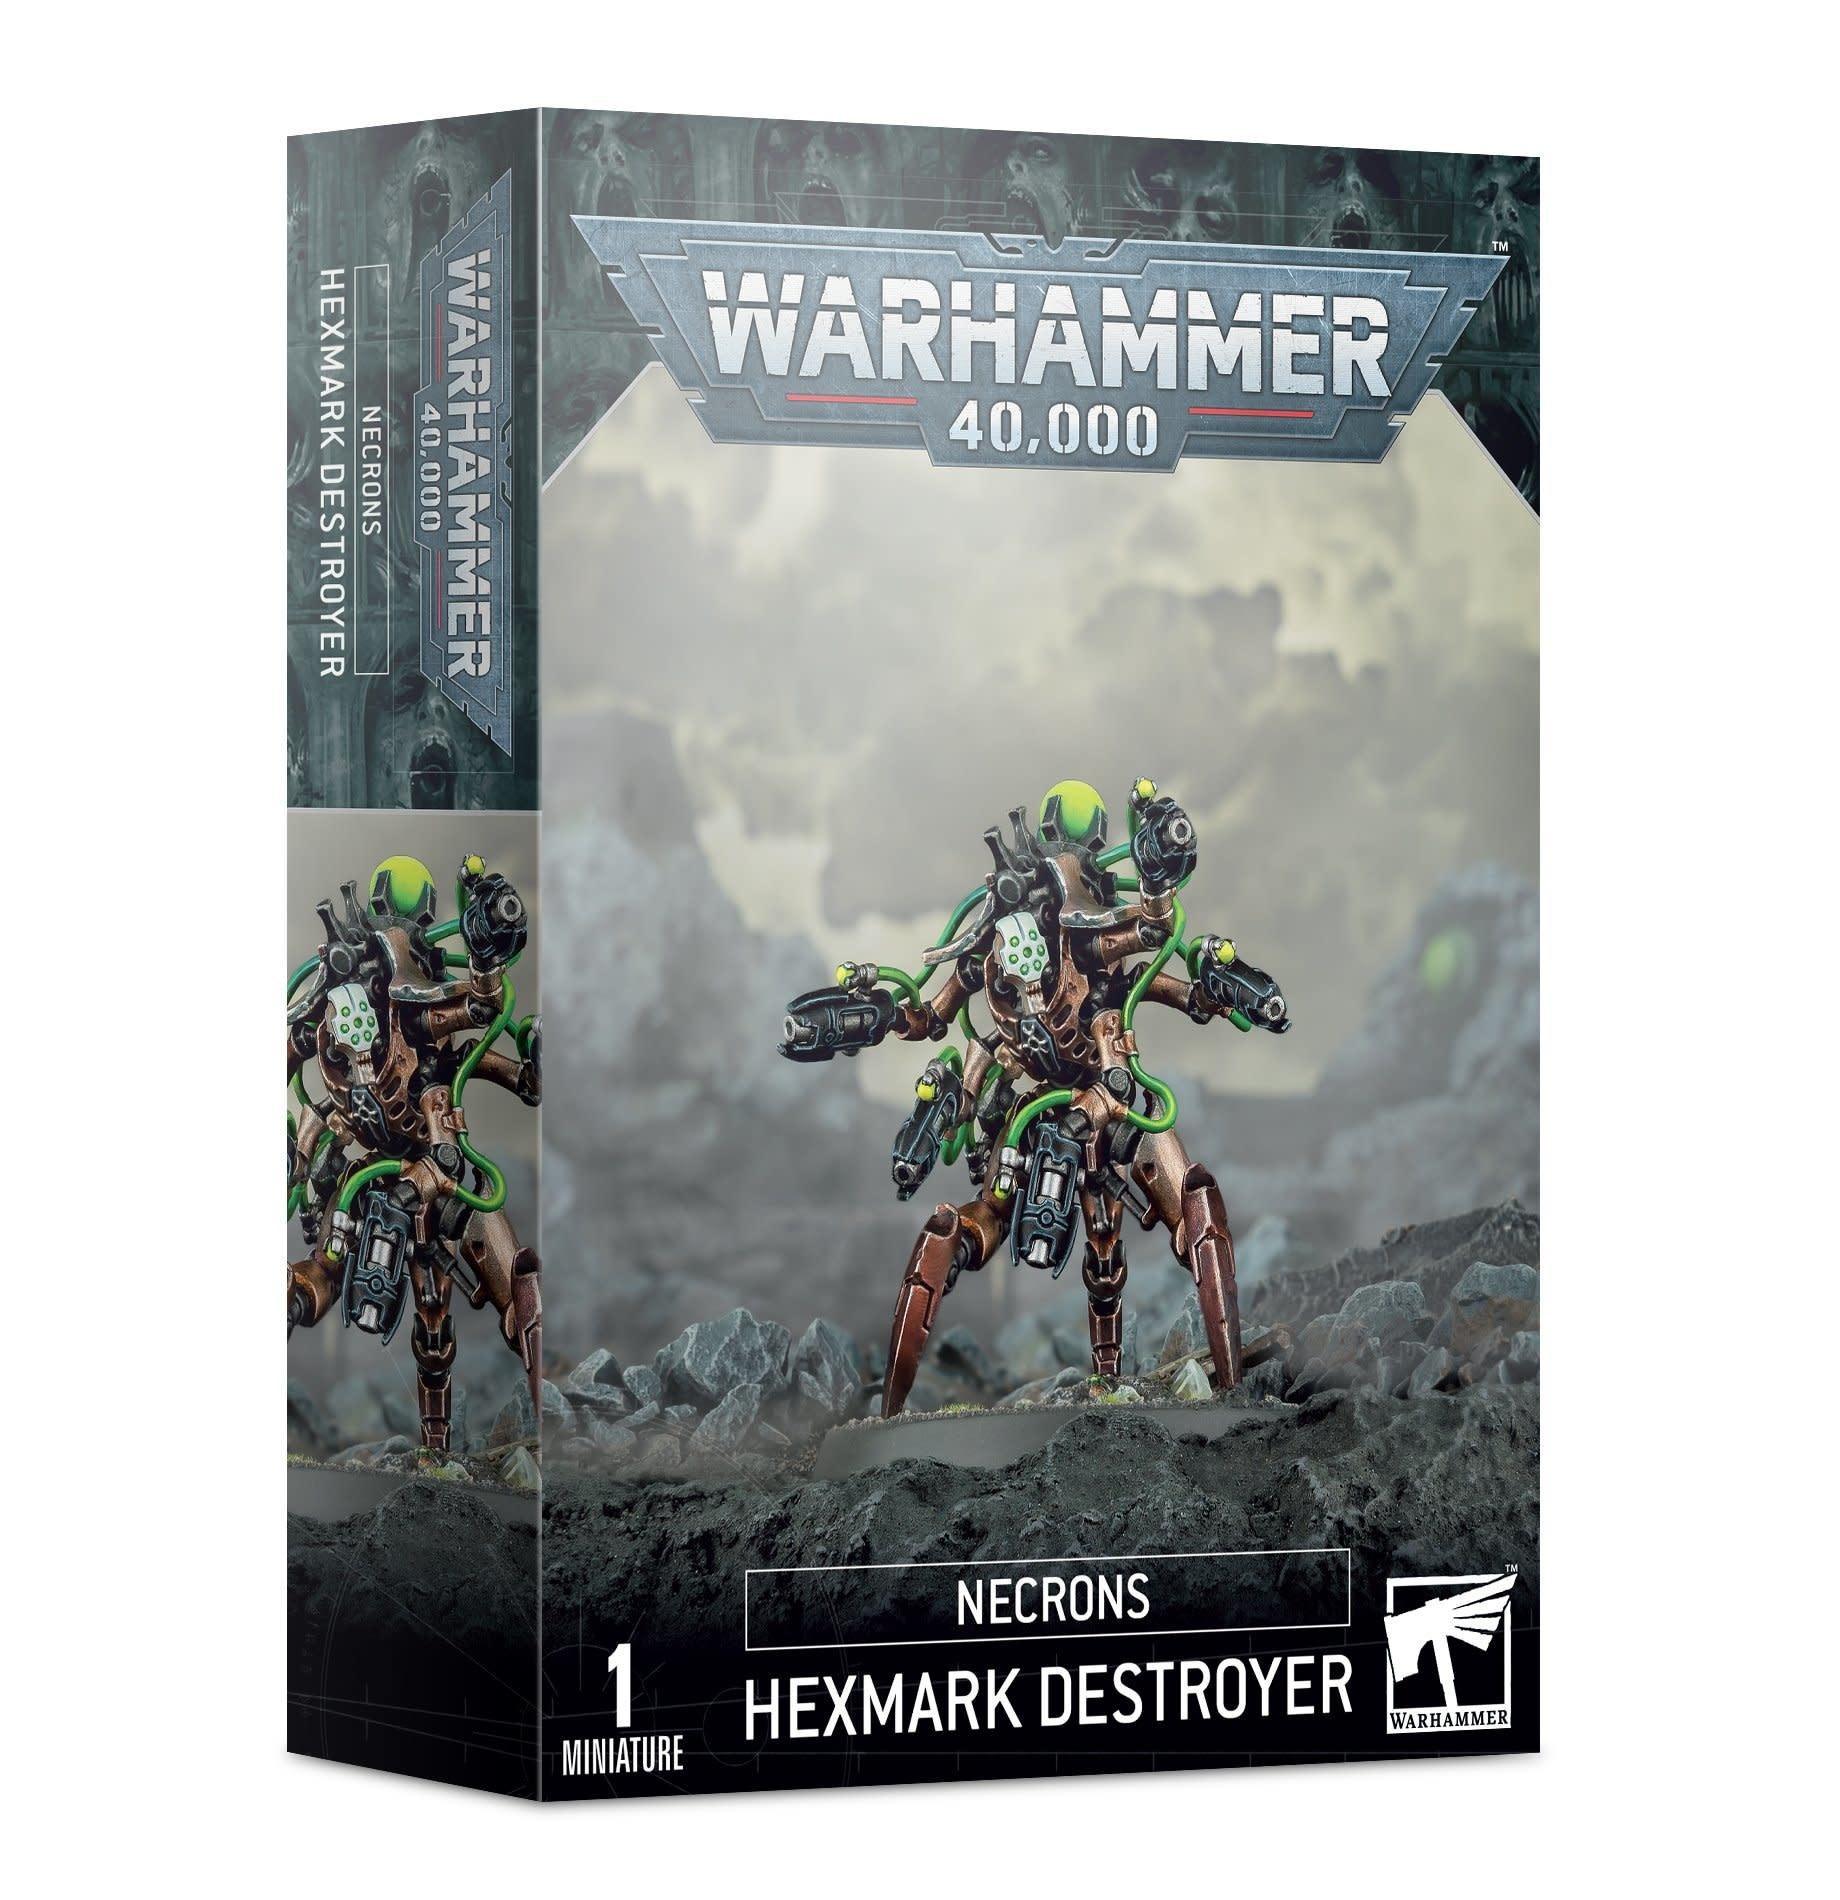 Games-Workshop Hexmark Destroyer